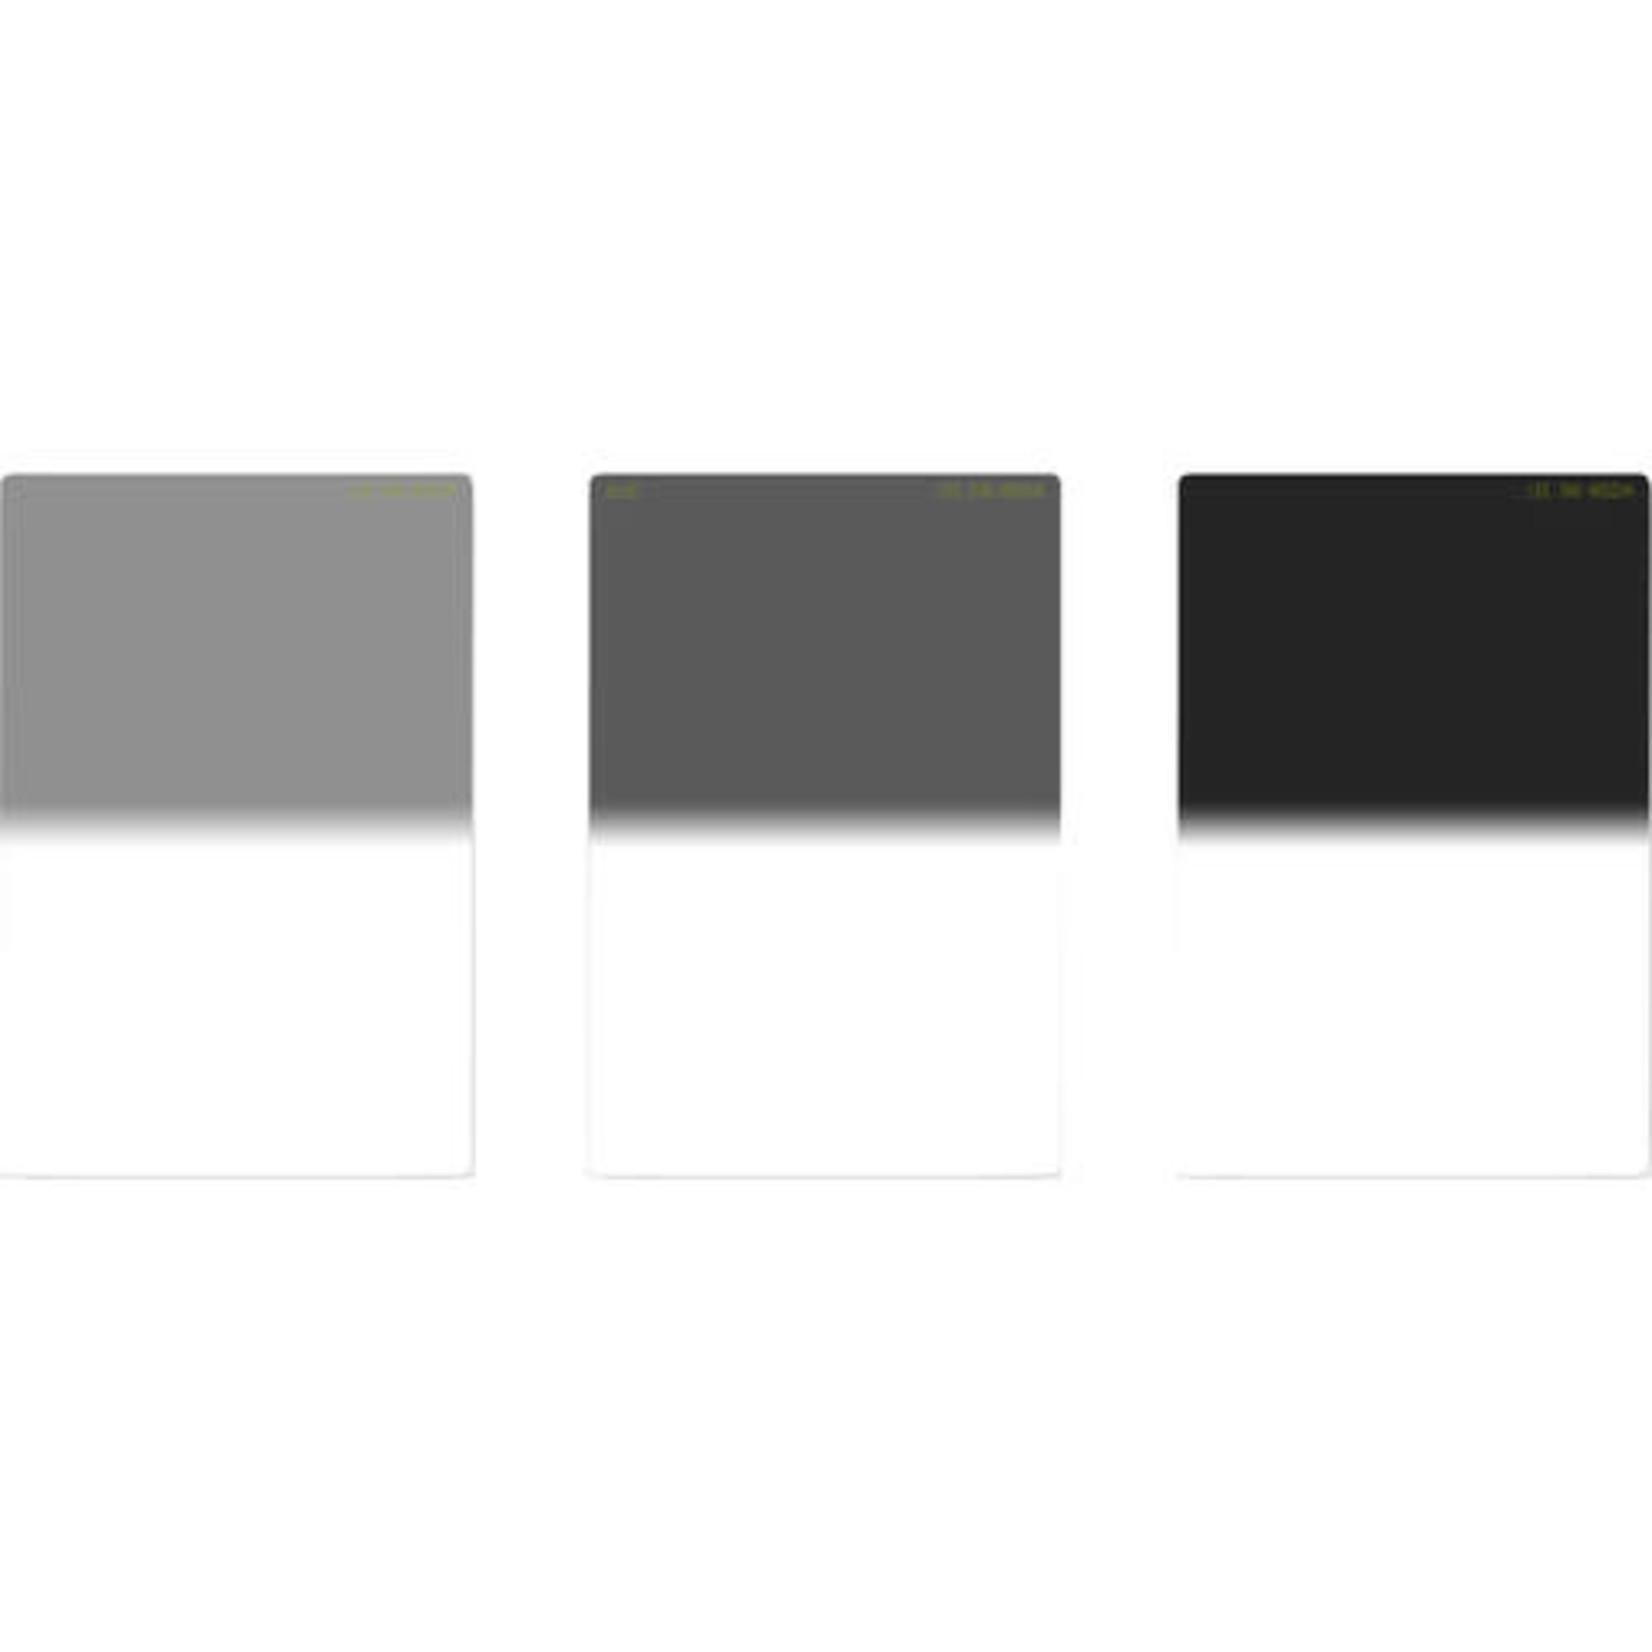 Lee LEE Filters 100 x 150mm Medium-Edge Graduated Neutral Density Filter Set